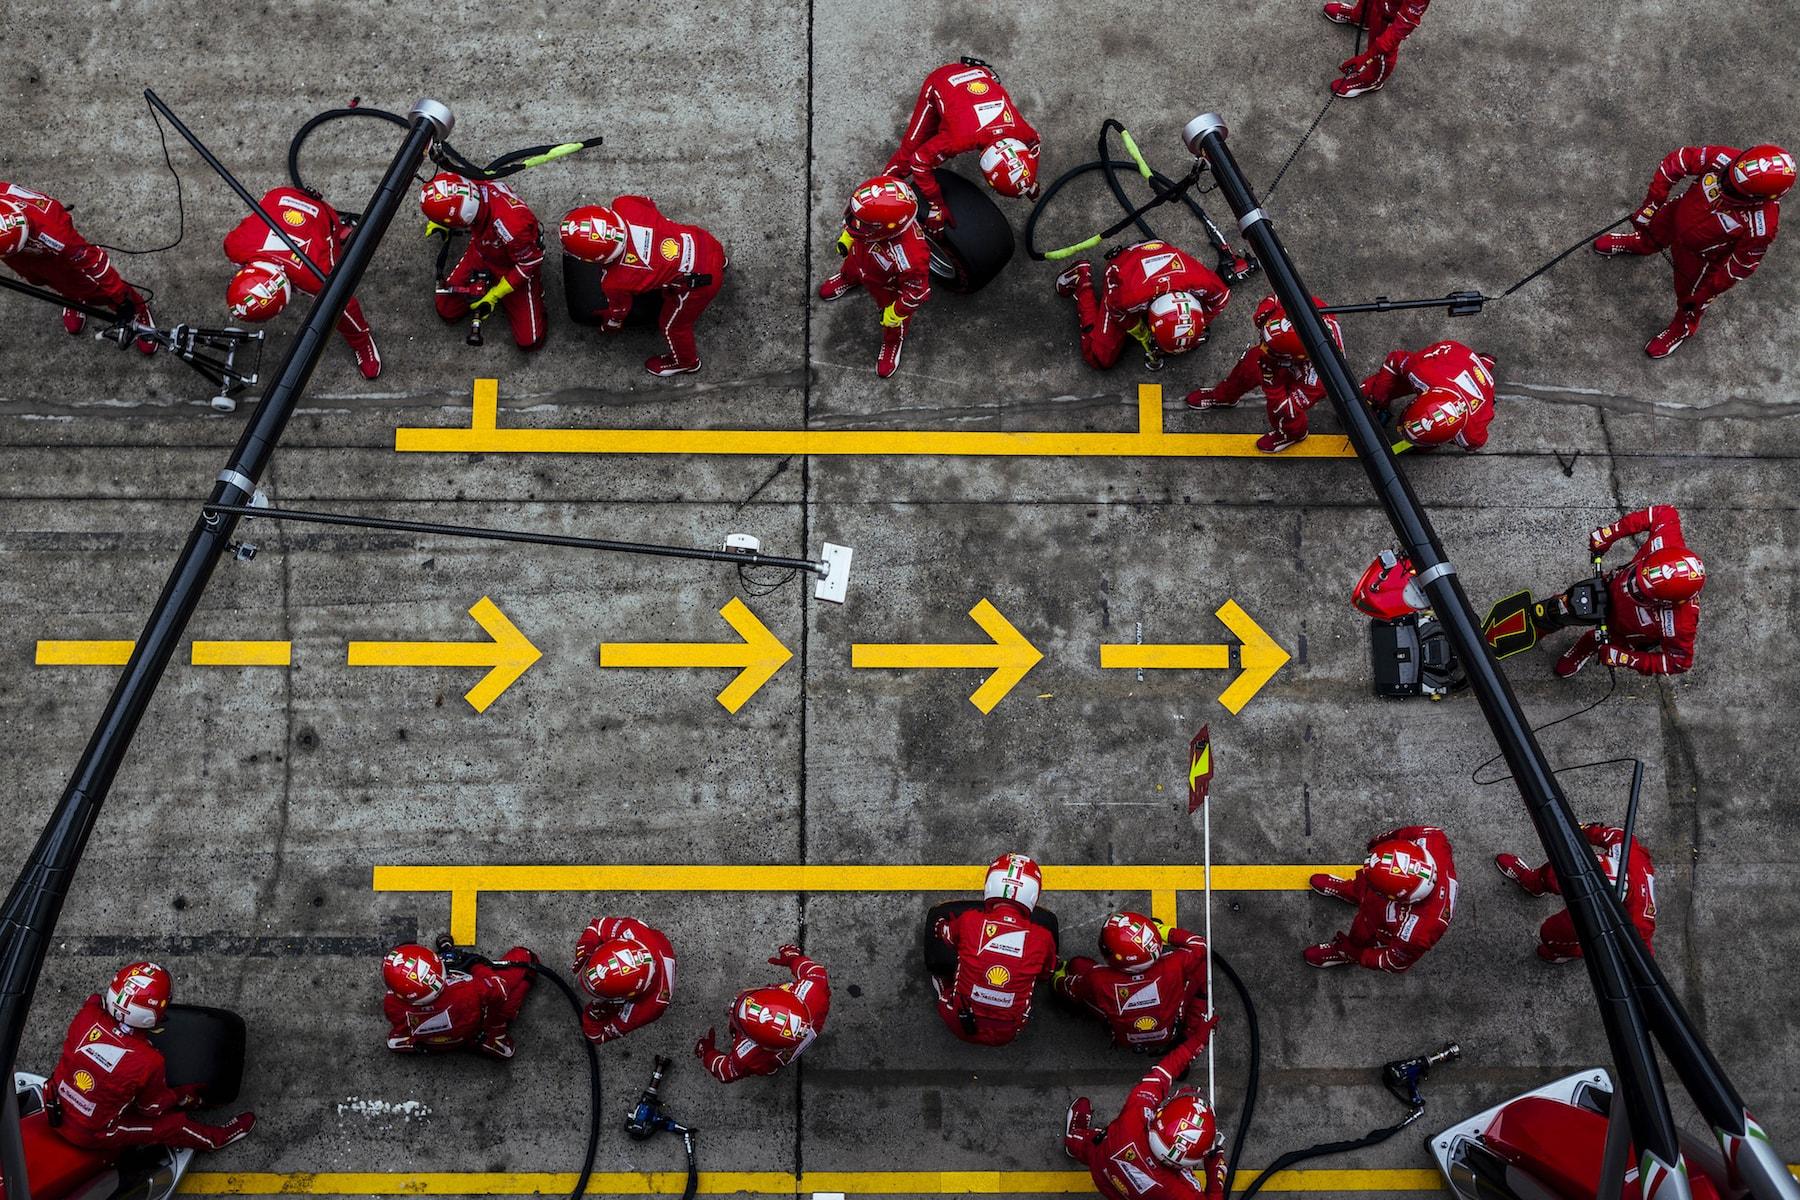 H 2017 Ferrari team ready for pitstop | 2017 Chinese GP copy.jpg